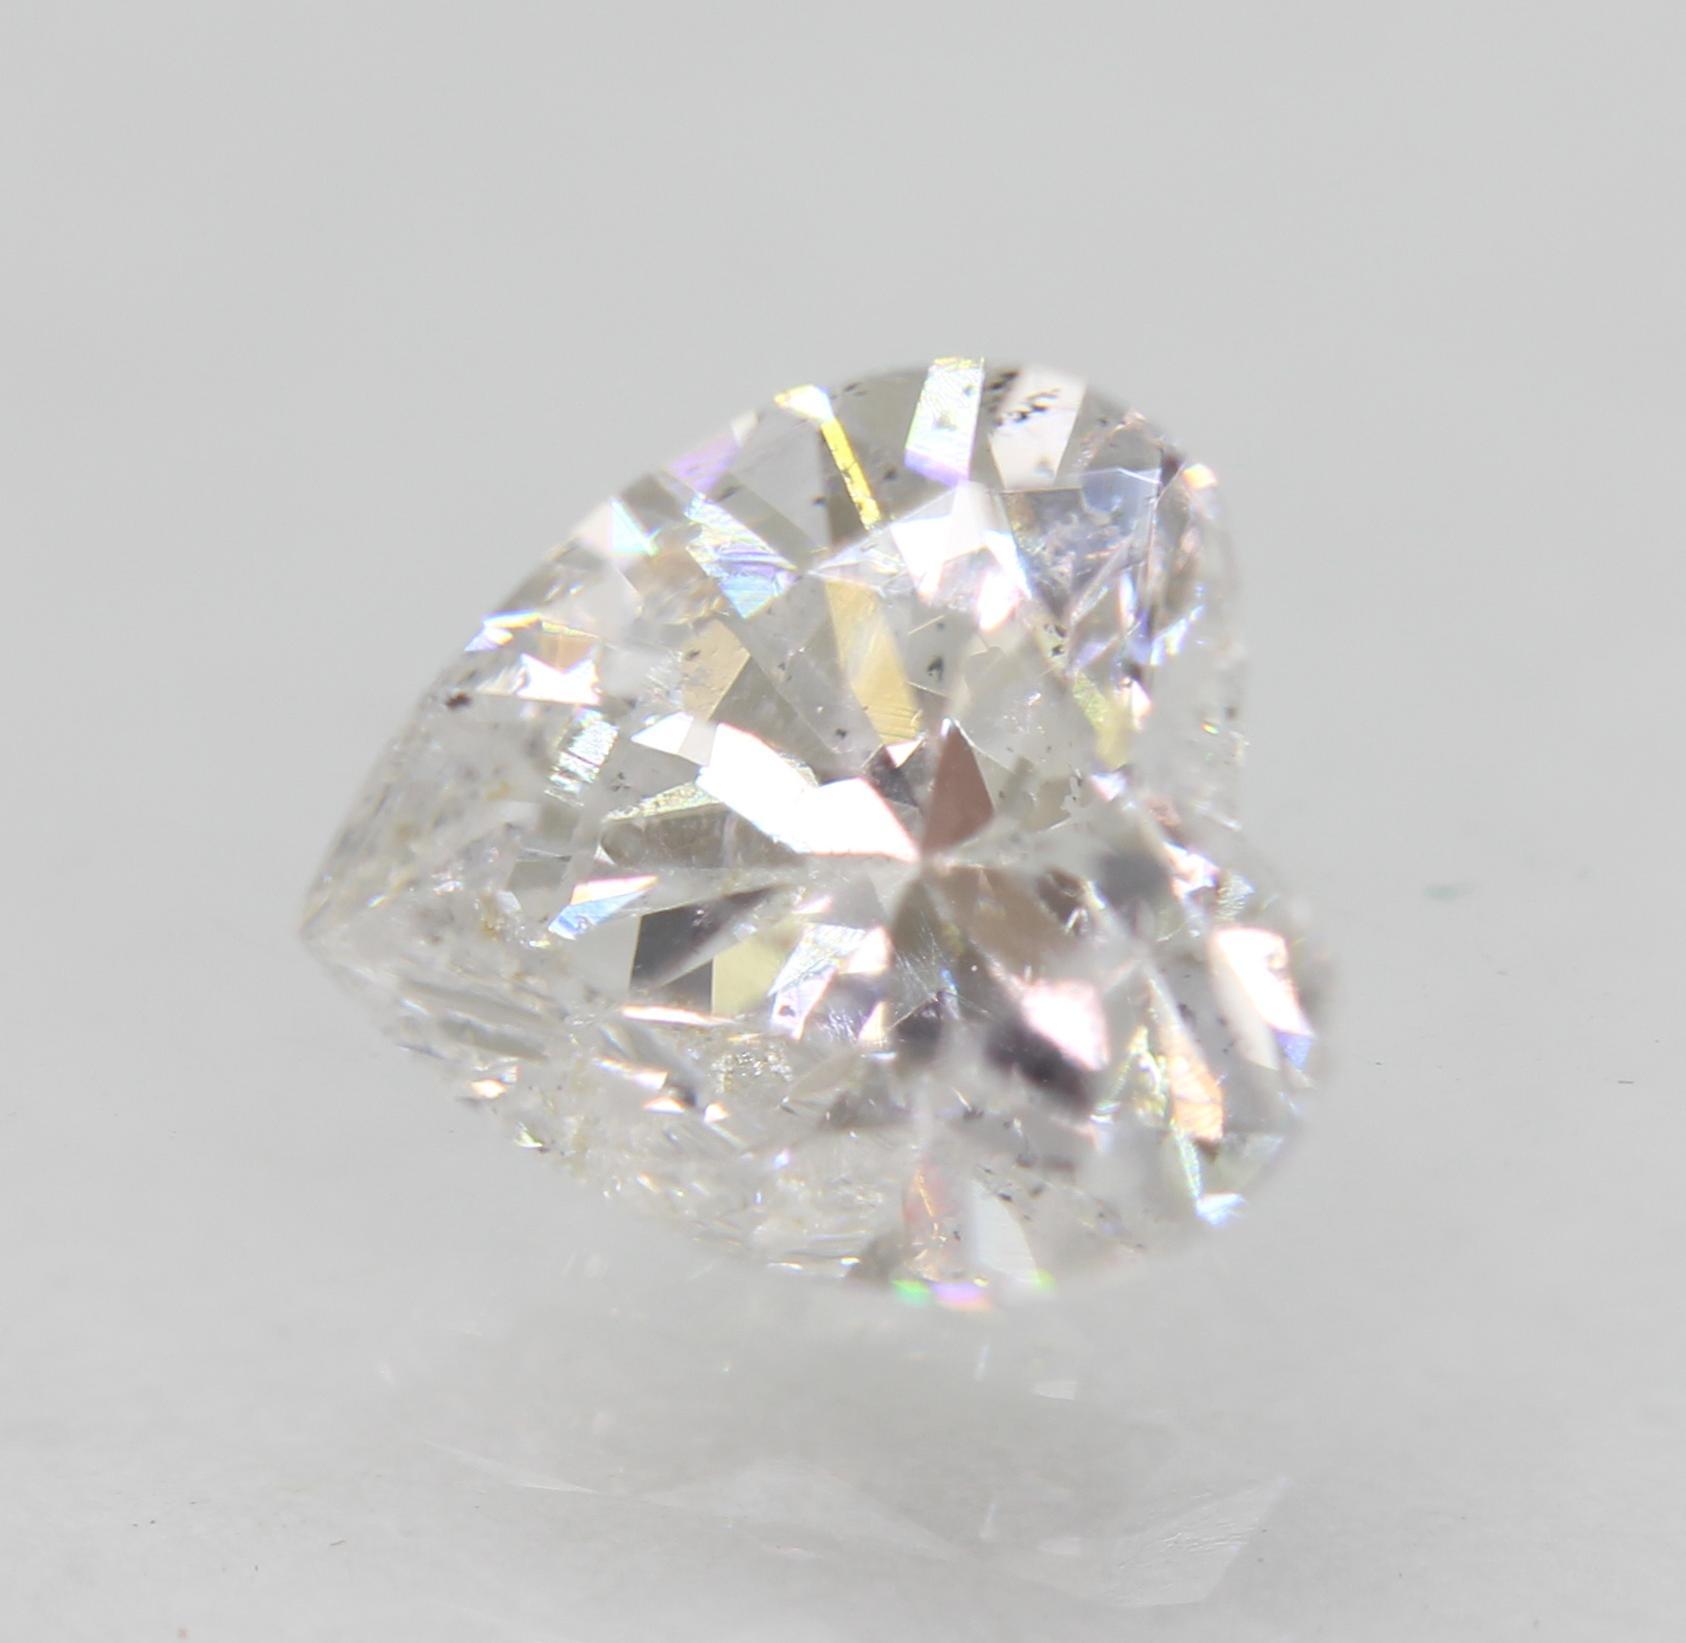 Certified 1.02 Carat D VS2 Heart Enhanced Natural Loose Diamond 6.43x6.08mm 2VG